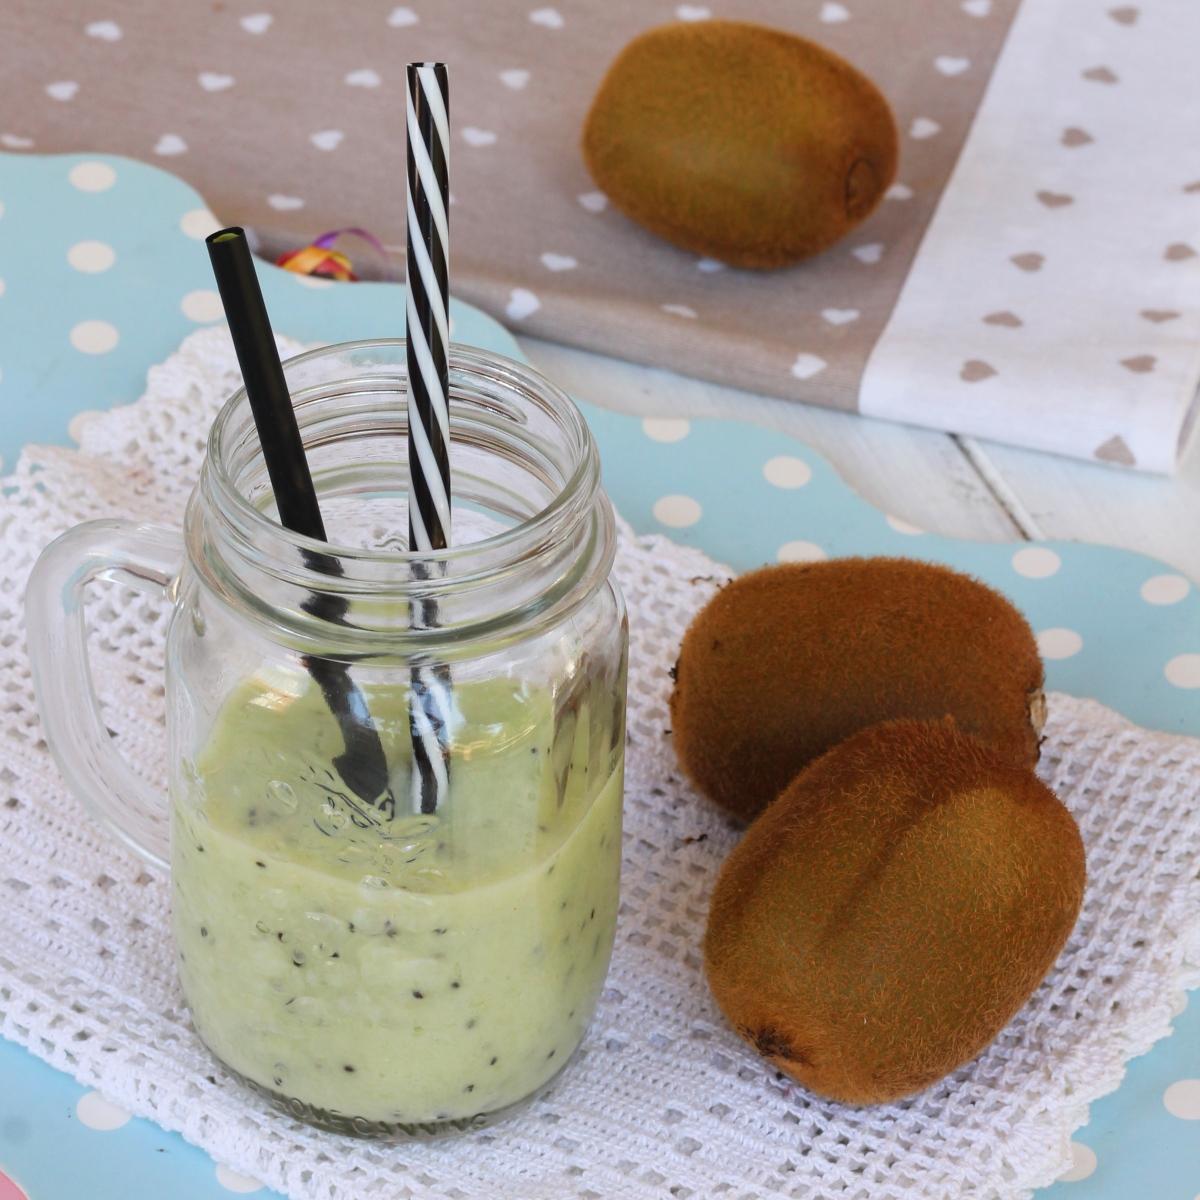 FRULLATO CON KIWI RICETTA smoothie al kiwi depurativo diuretico